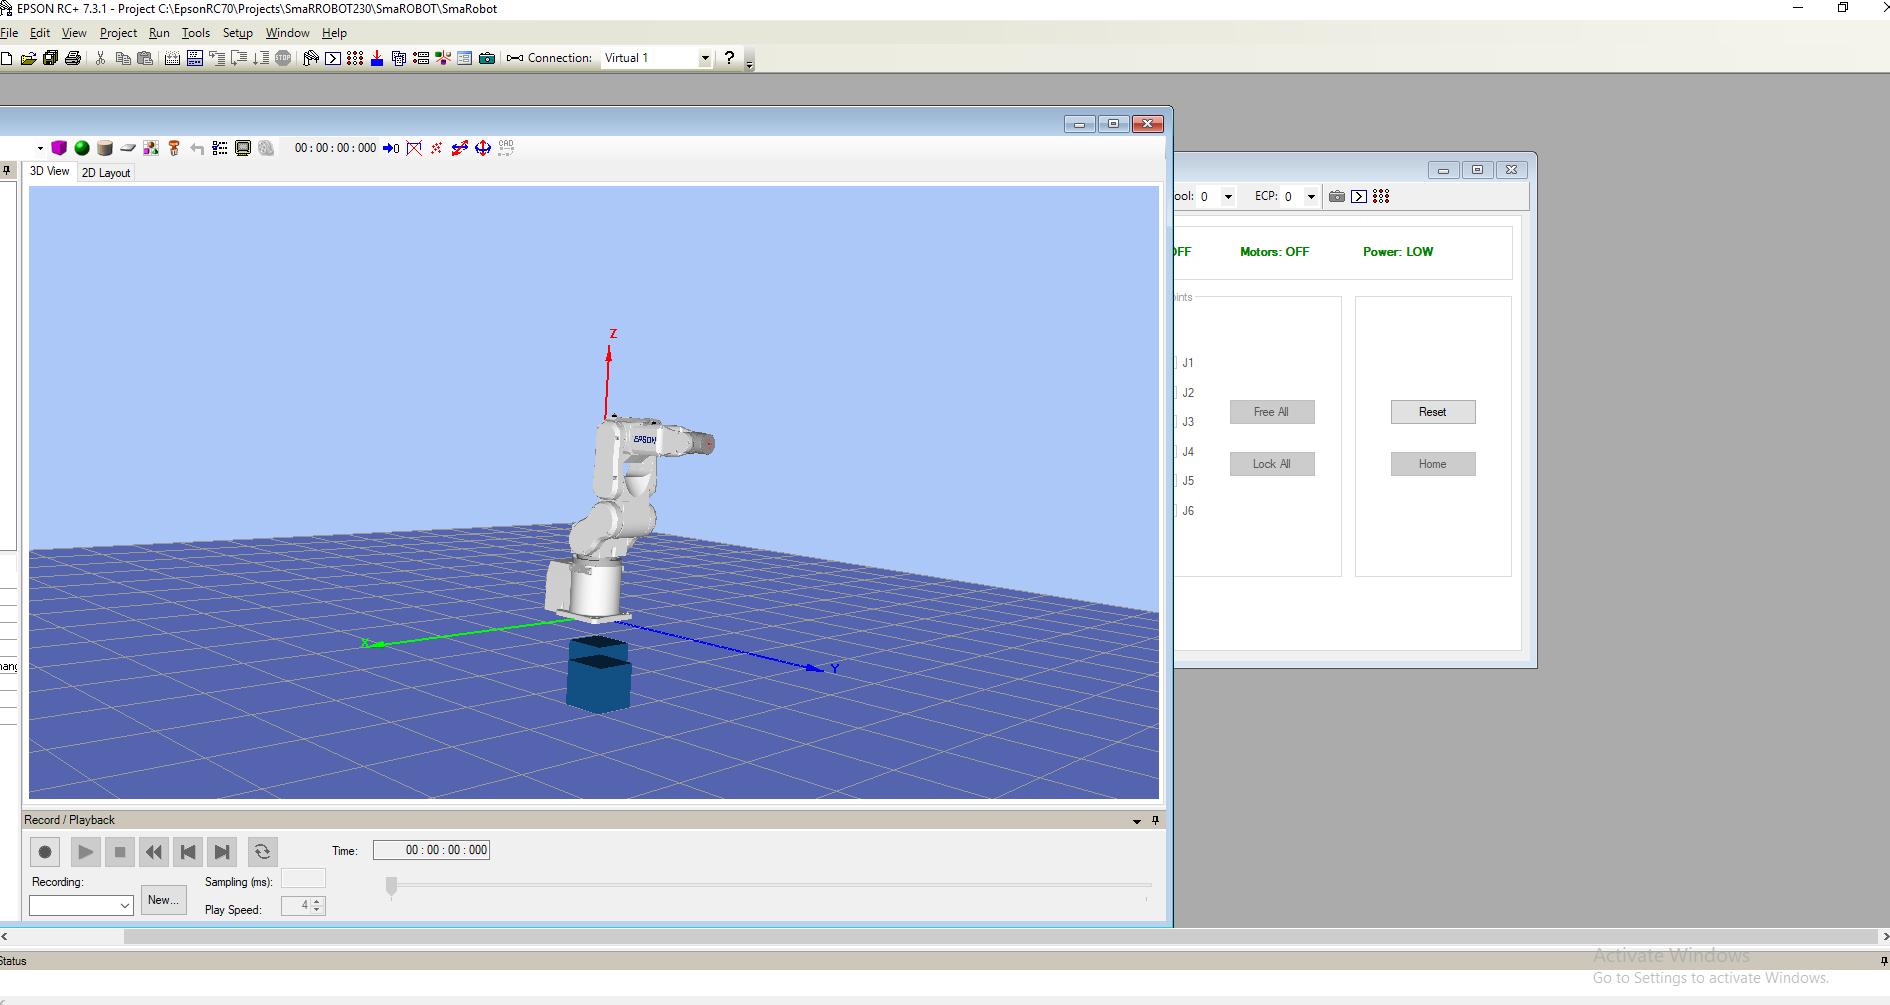 Advantec Smasoft Robot Arm